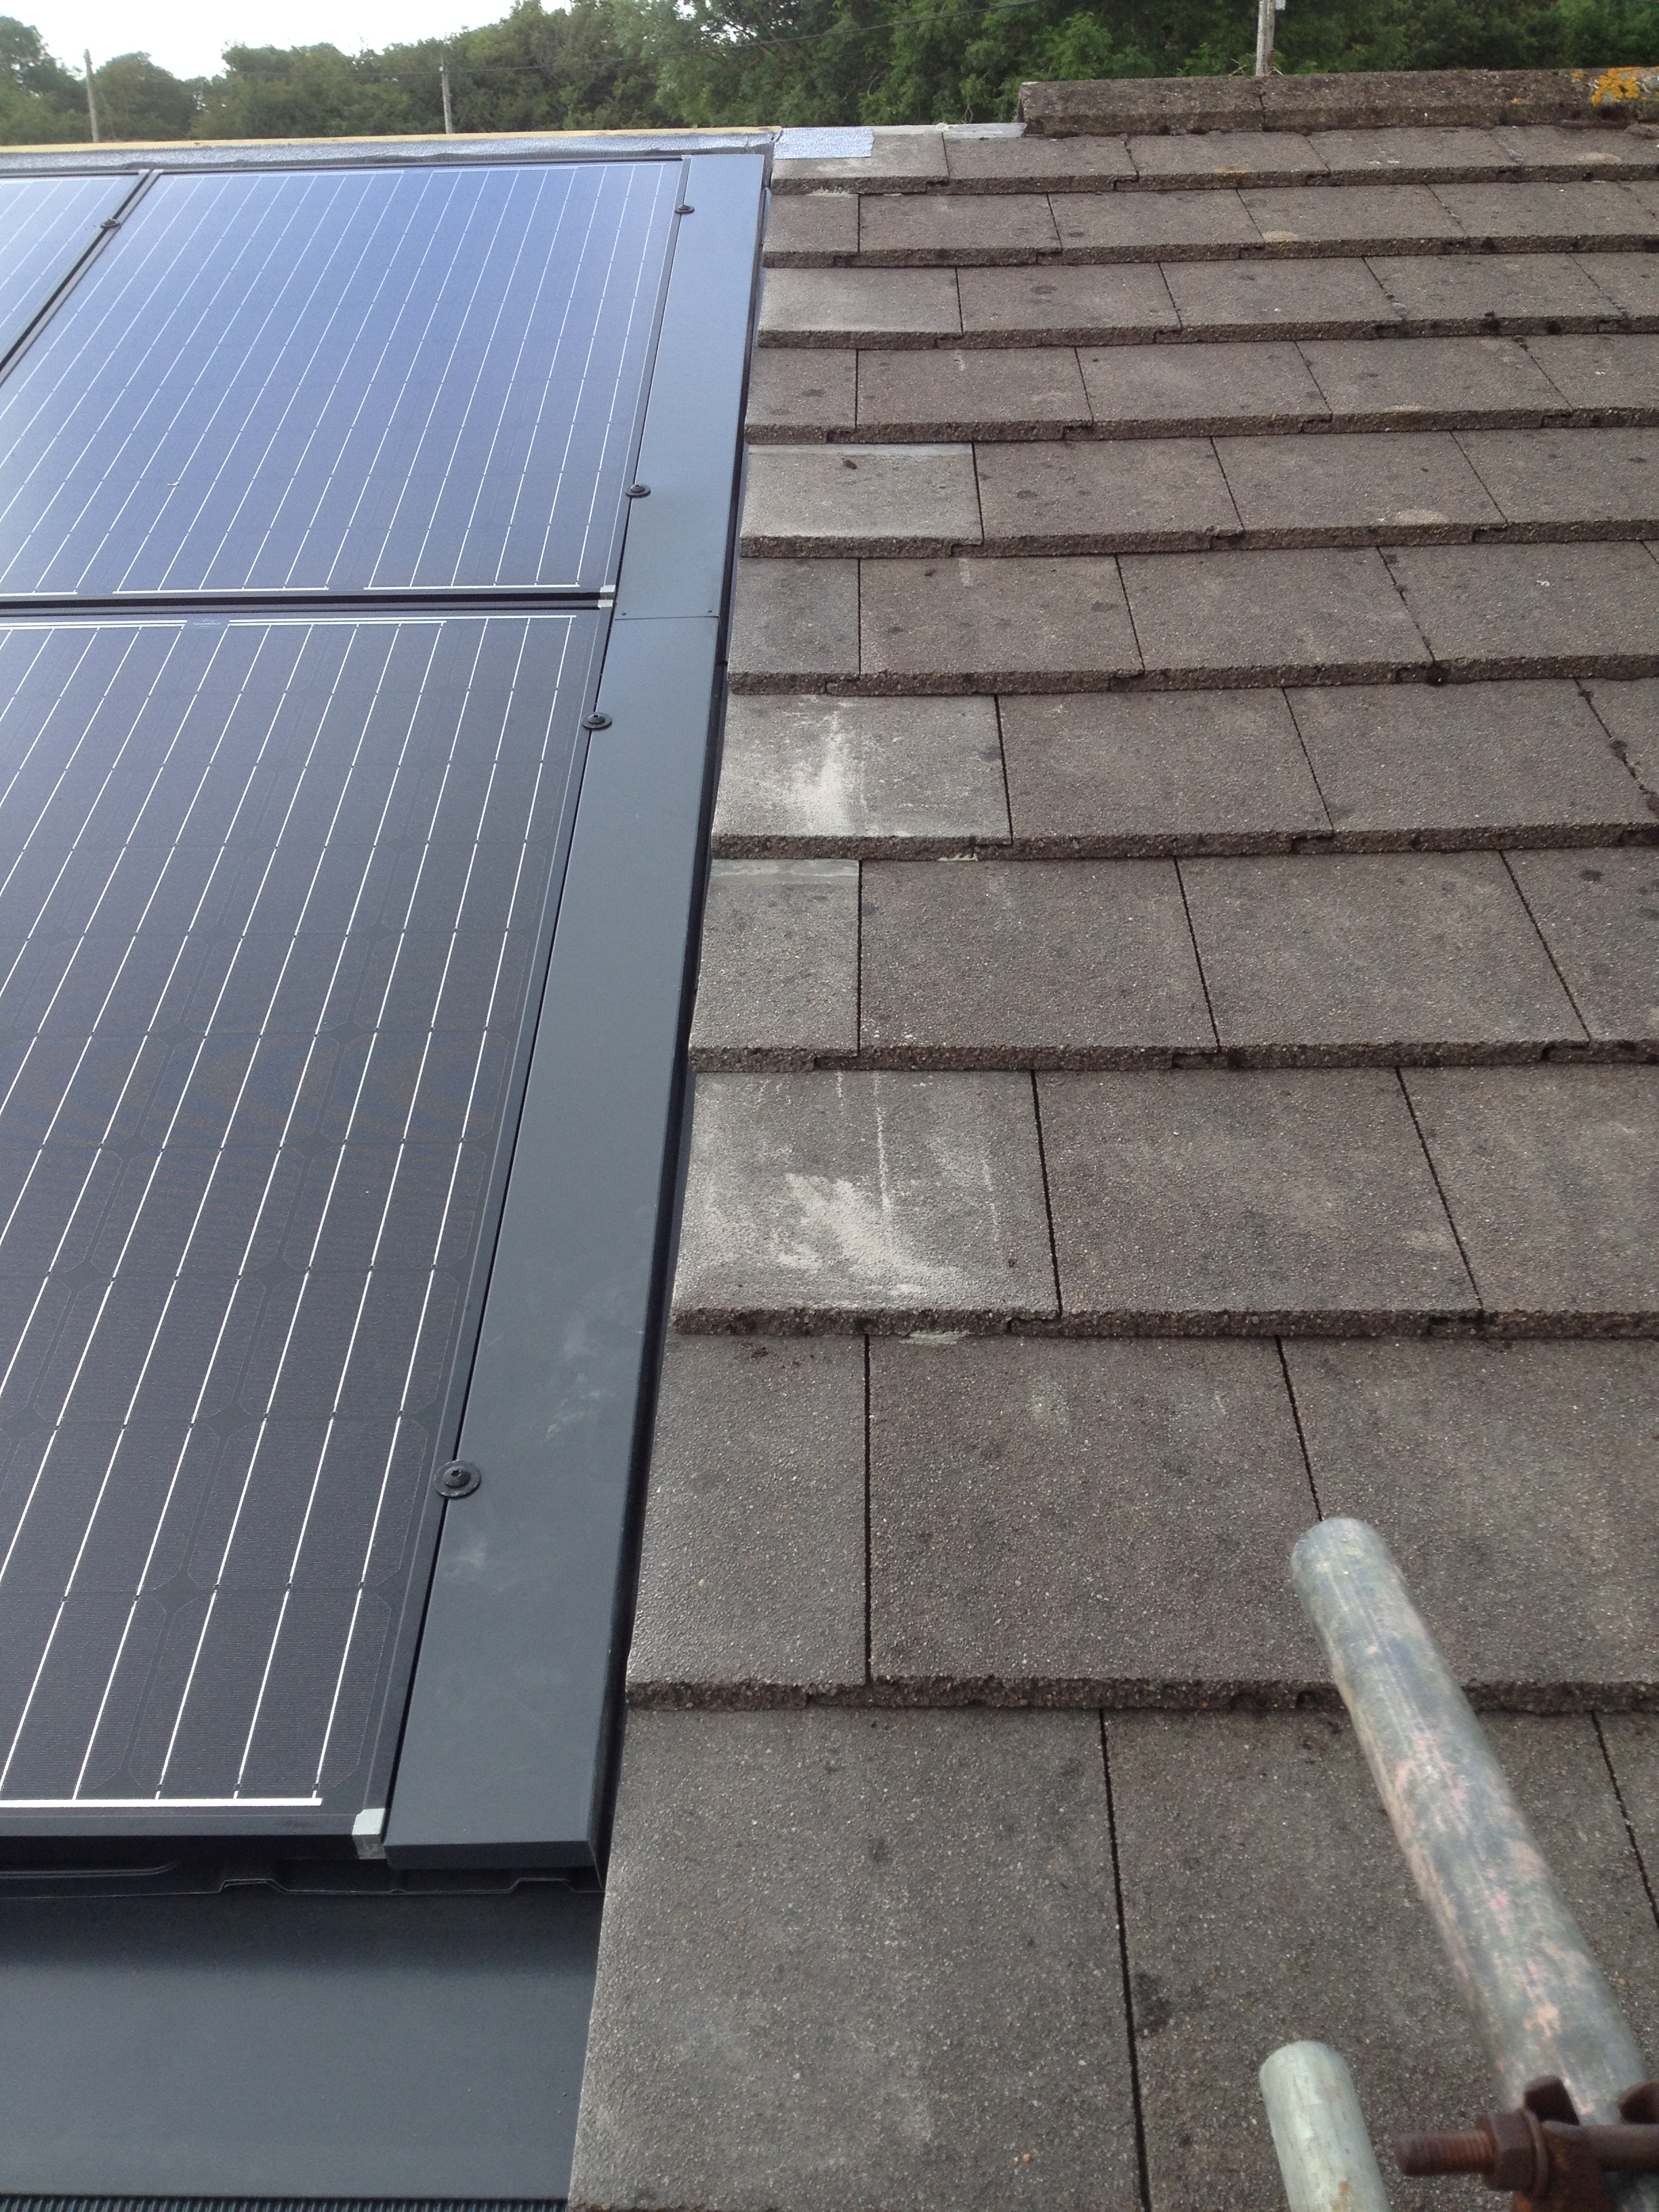 » Solarworld Sundeck On Tiled Roof